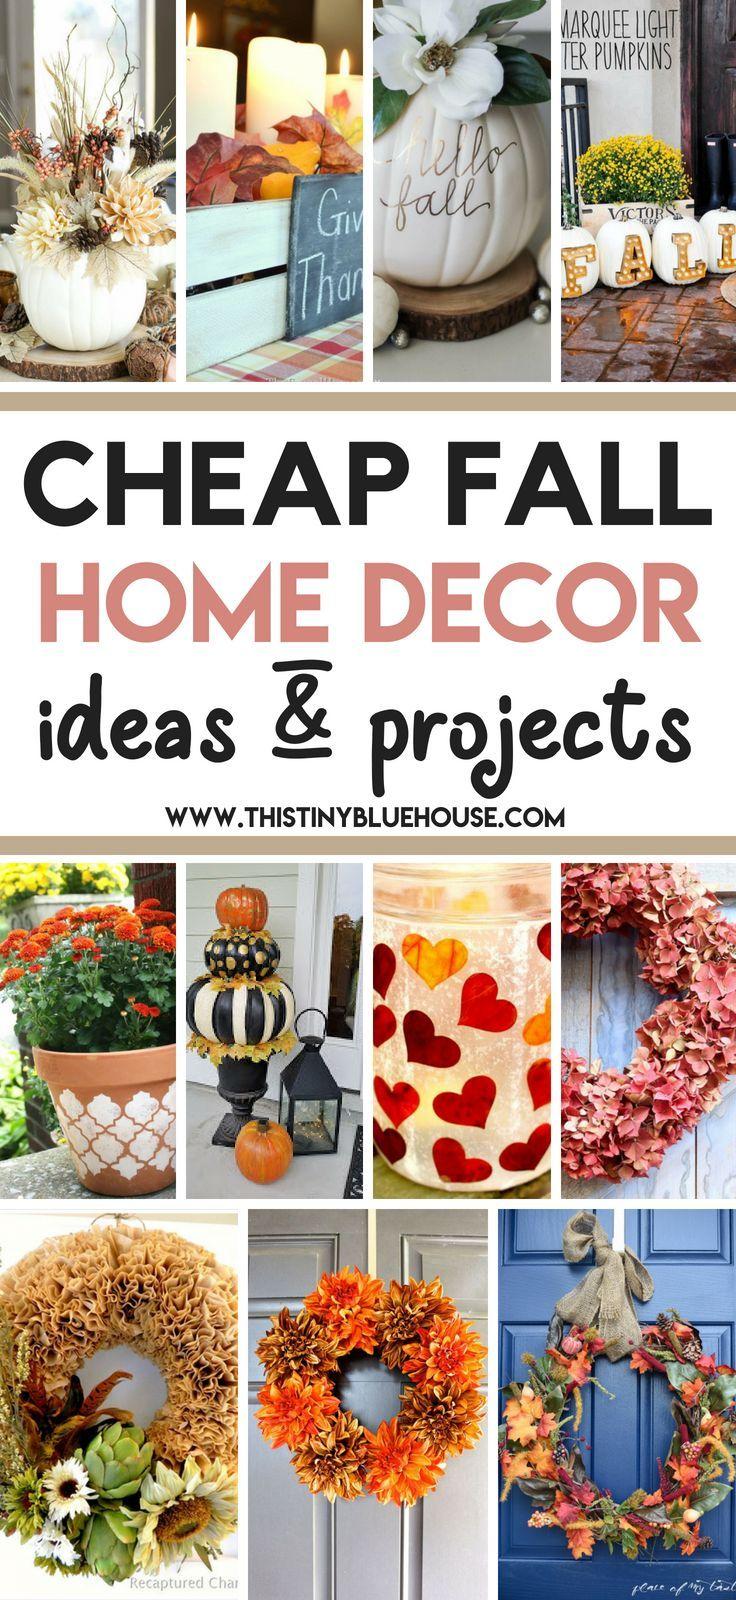 35 Stunning Dollar Store Diy Fall Decor Ideas Fall Decor Diy Fall Home Decor Fall Decor